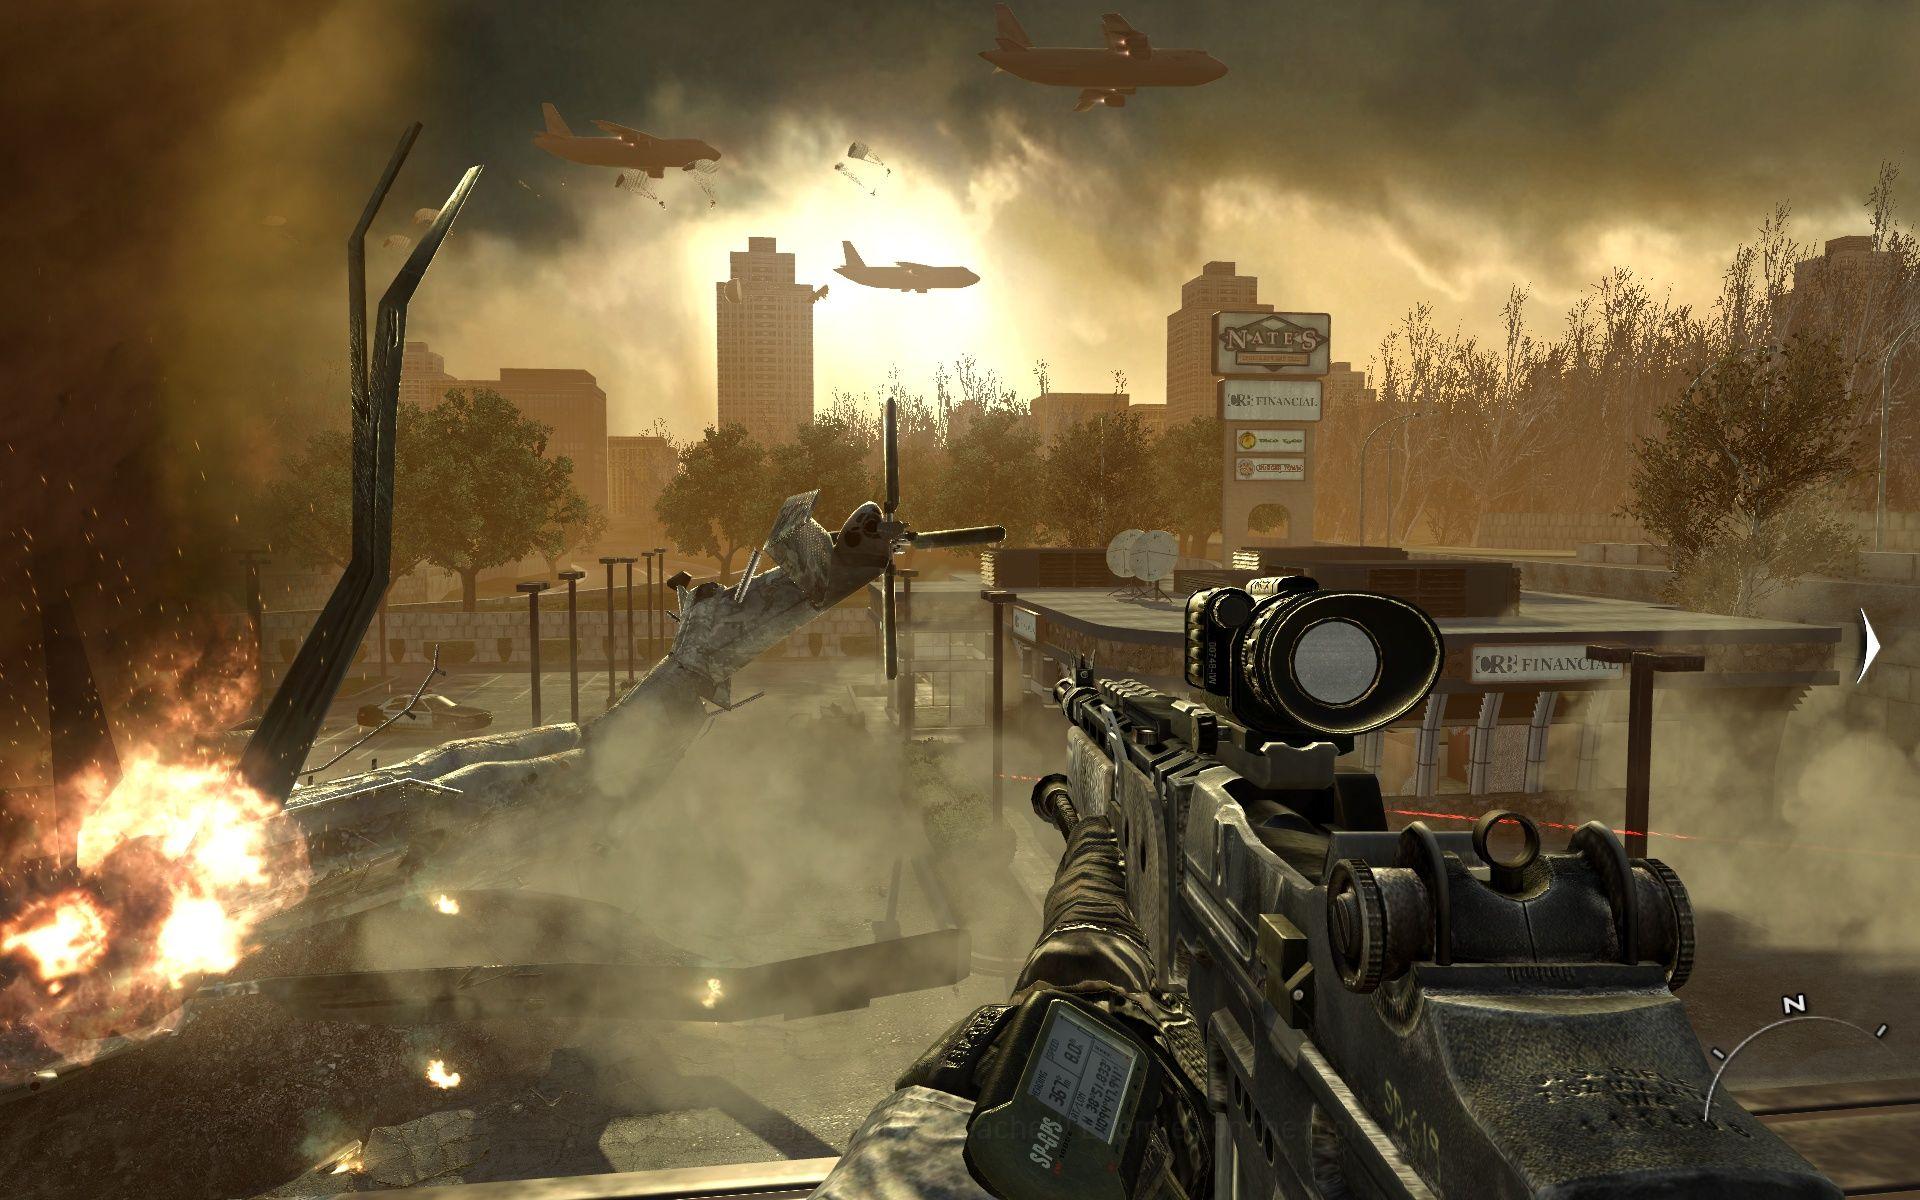 Call of Duty: Modern Warfare 2 Windows Feels a bit like the end of the